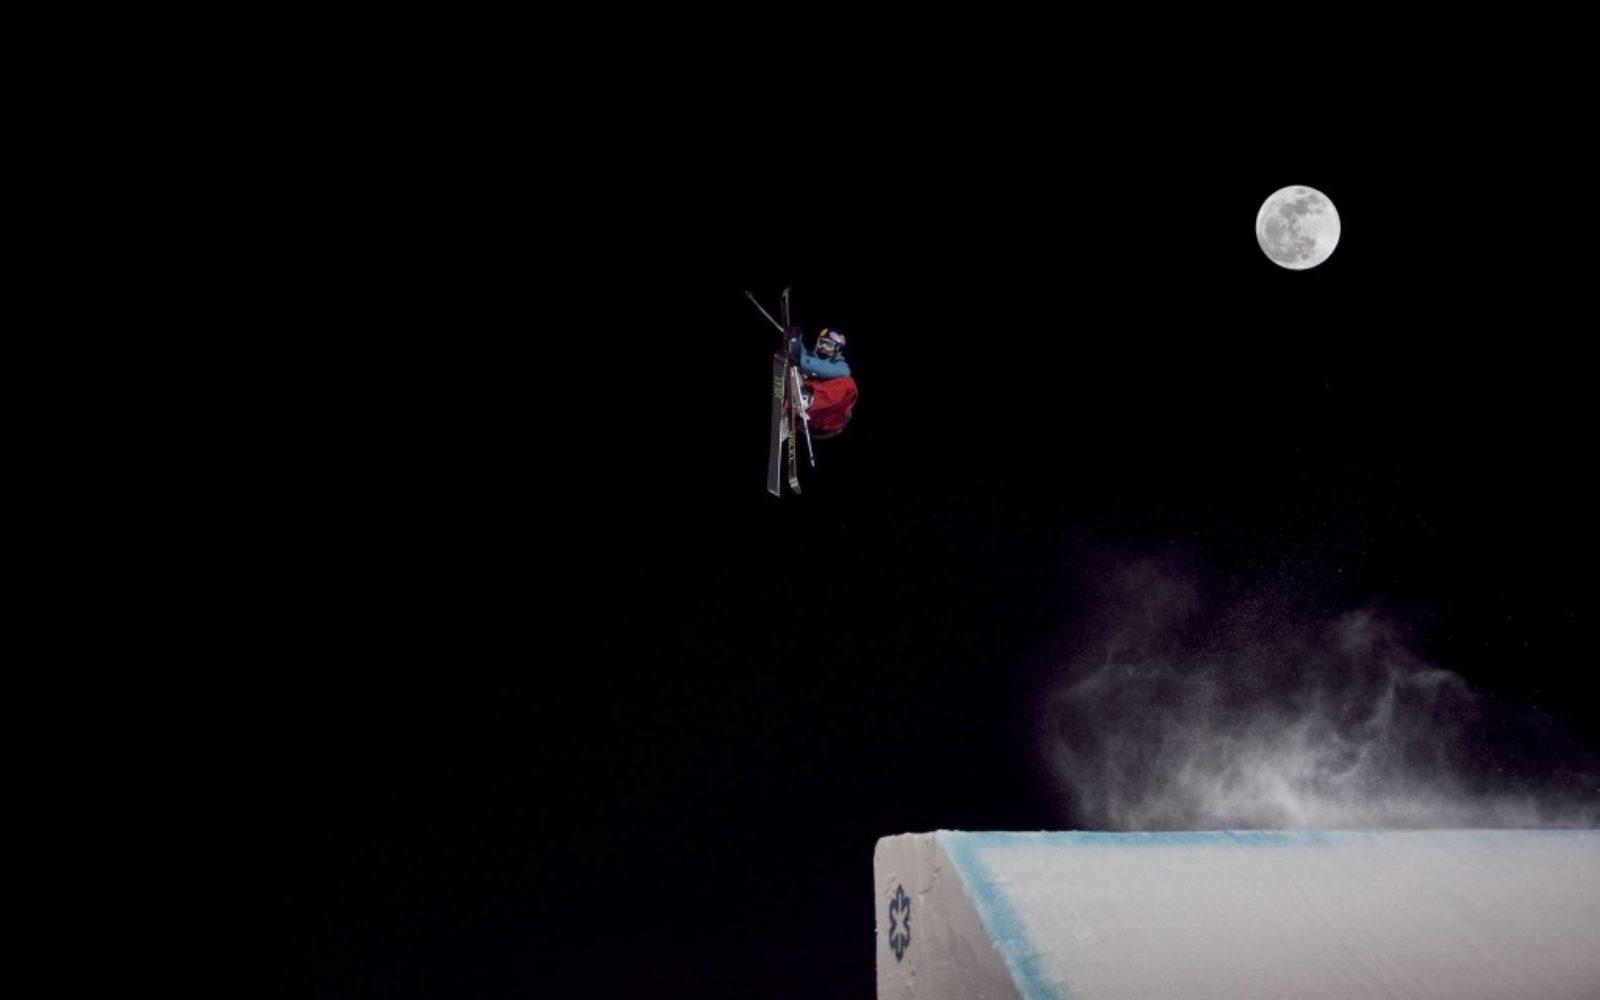 sports-xgames-skier-moon-1024x640